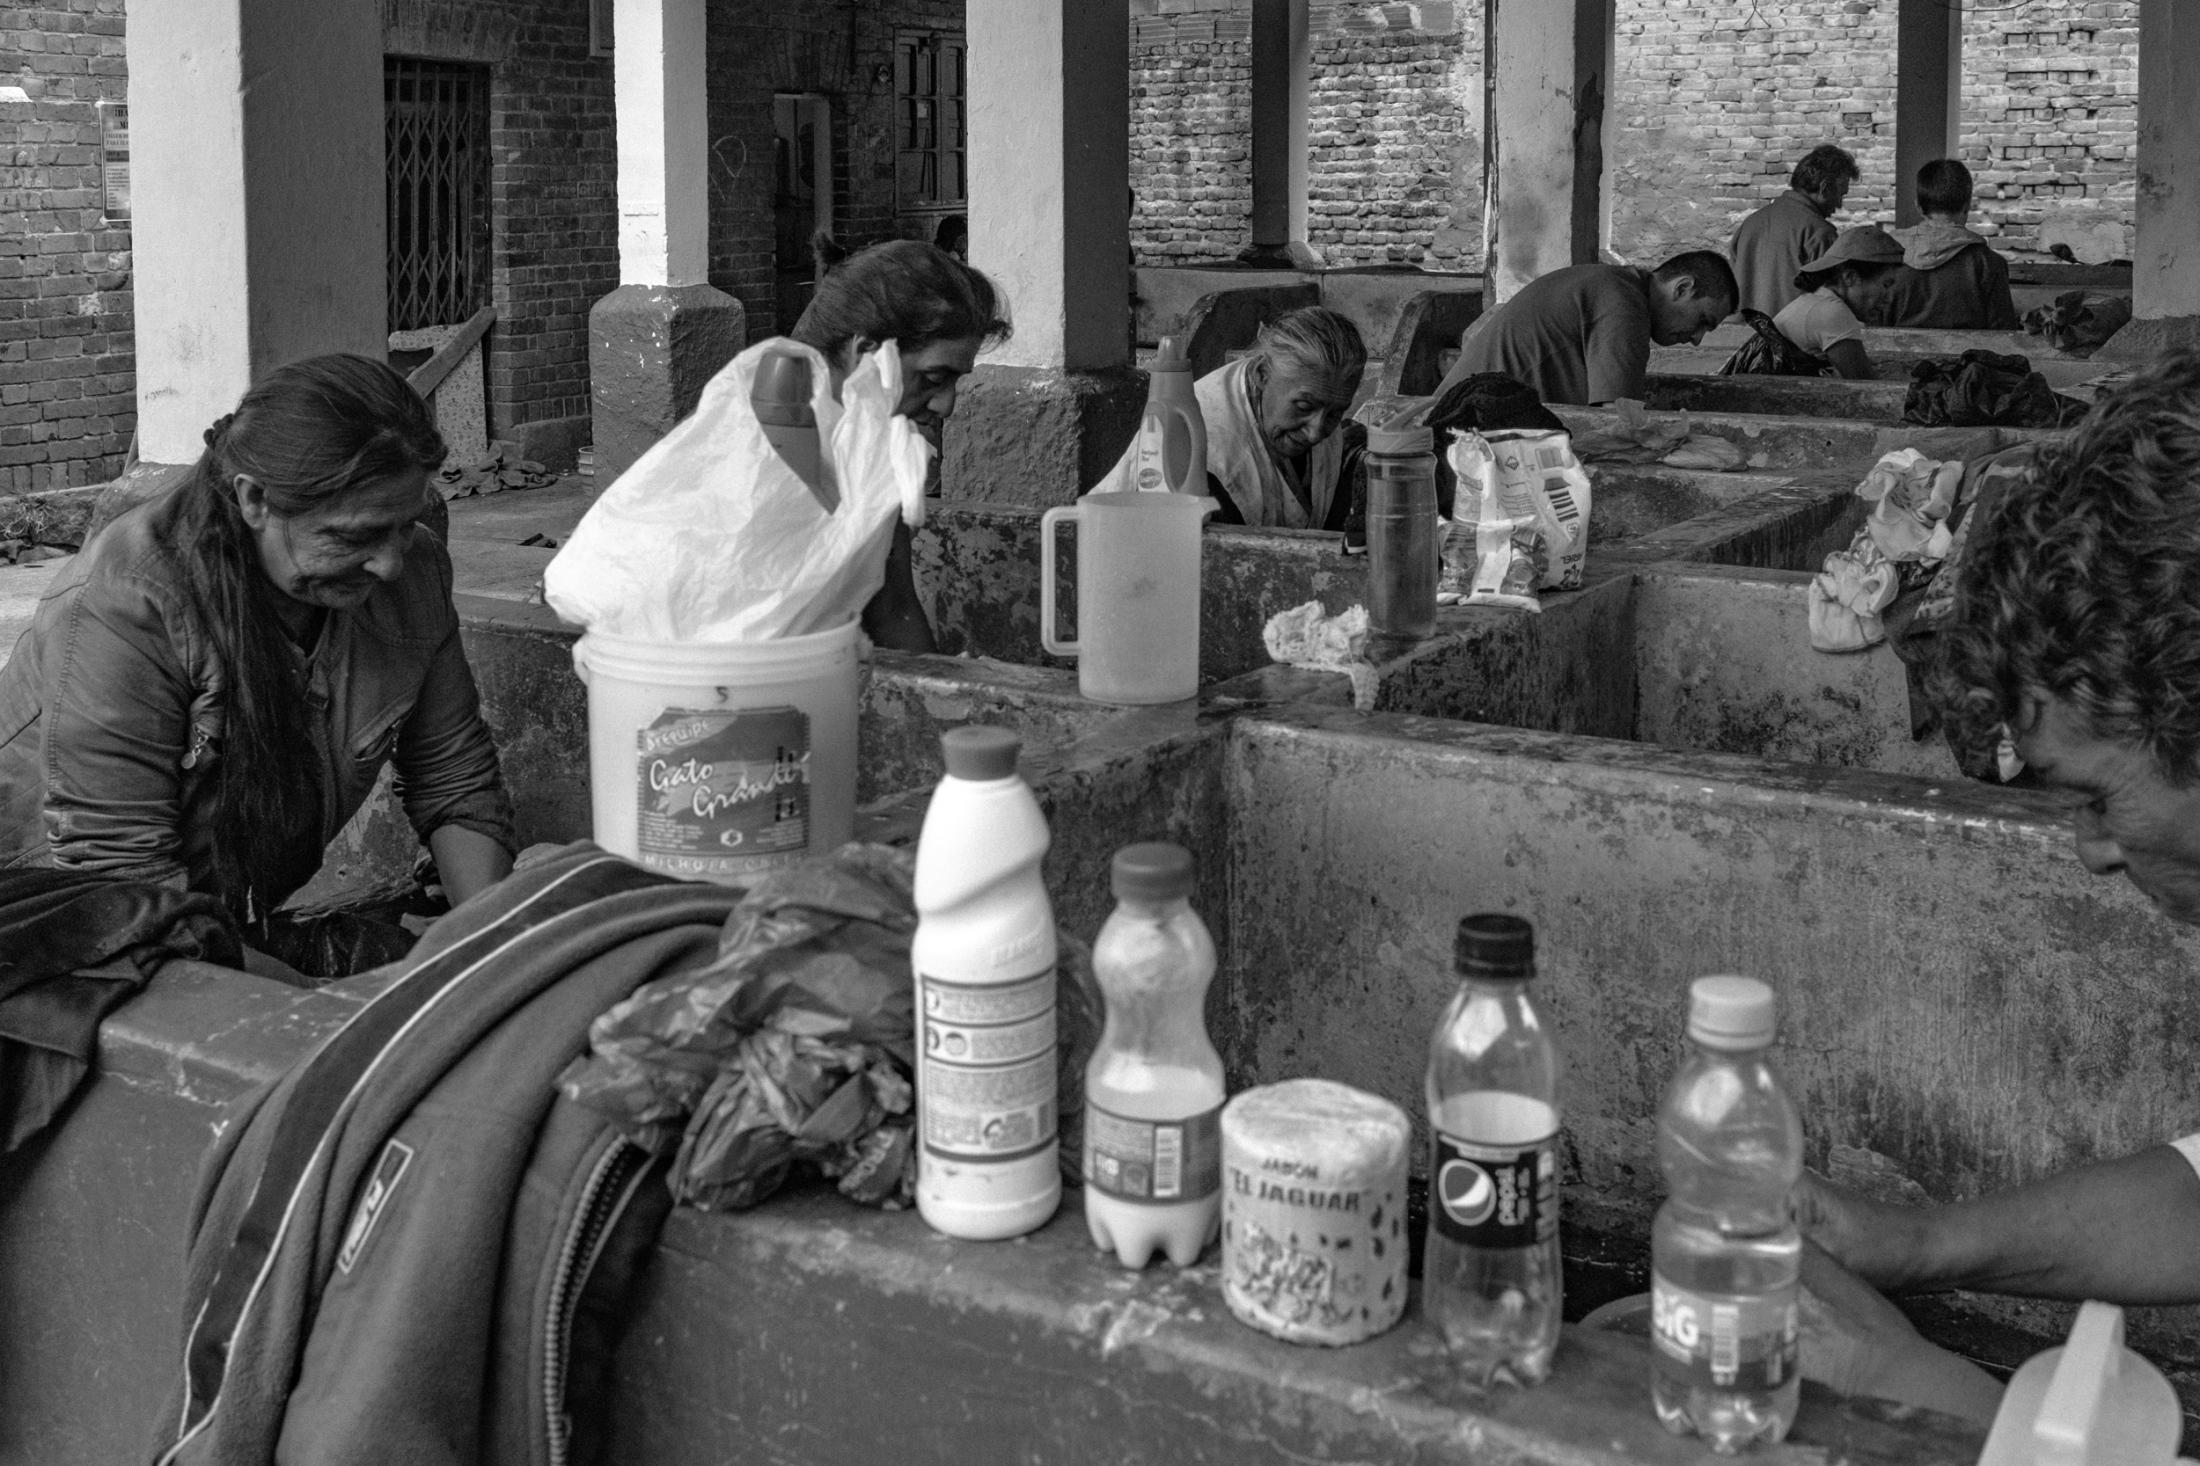 Art and Documentary Photography - Loading ZuletaR__os_CarangasYElJaguar_015.JPG